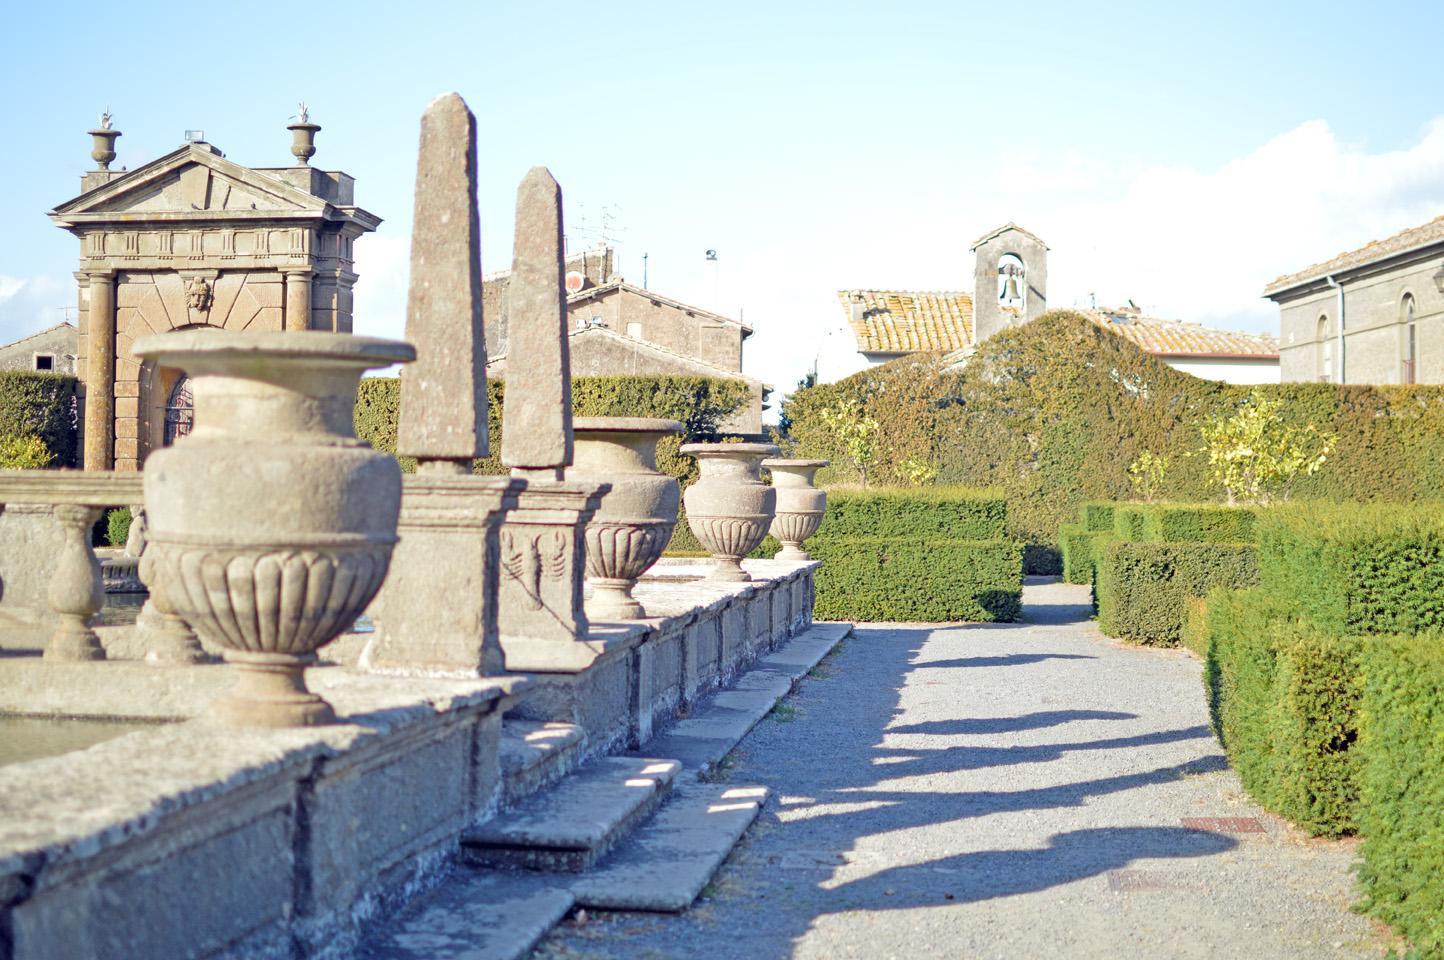 41 #WhereToGo: Villa Lante